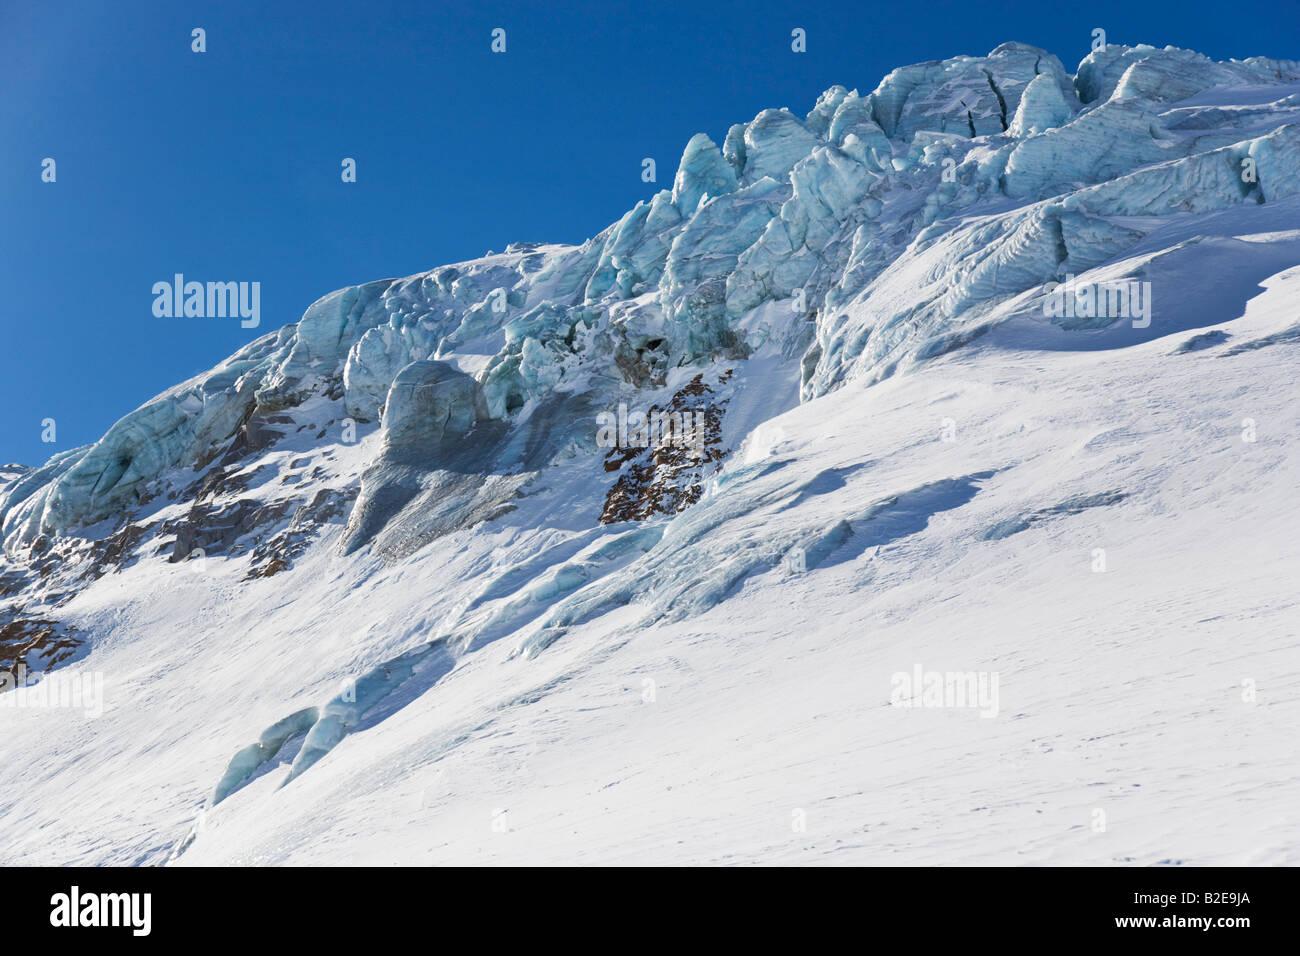 Snowcovered montagne sous ciel bleu, Ochsentalergletscher, Silvretta, Vorarlberg, Autriche Photo Stock